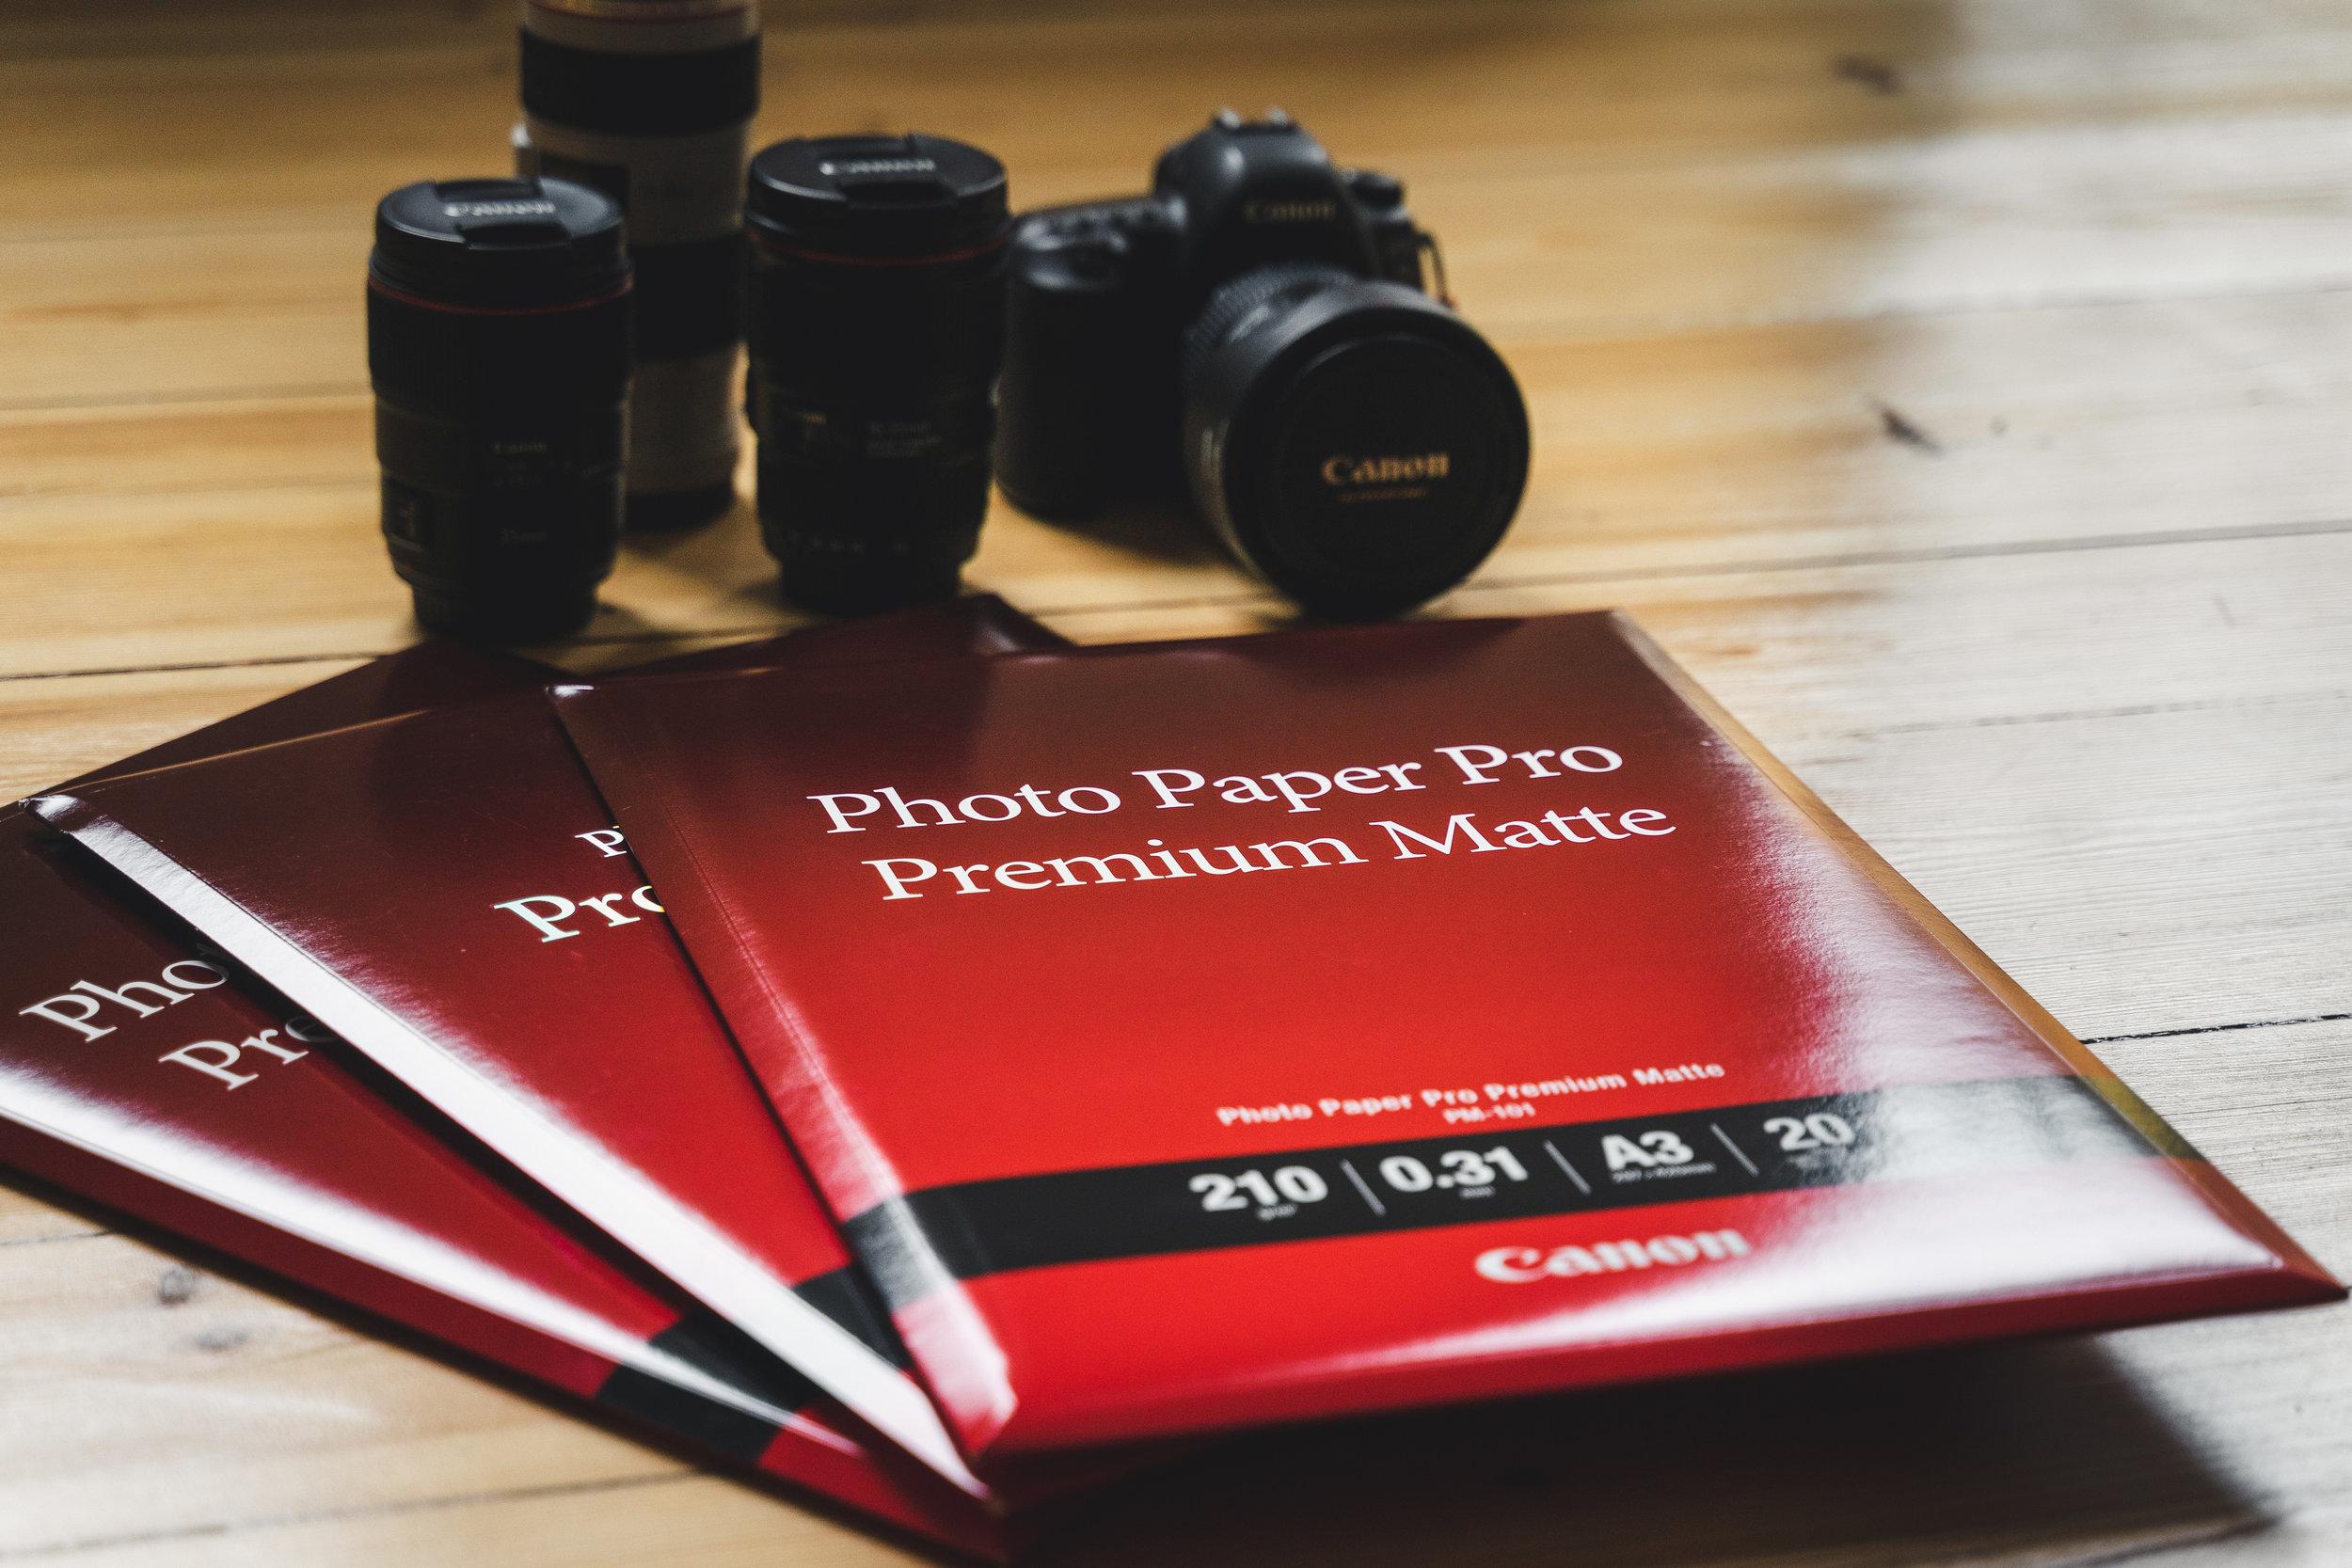 Canon Premium Photo Papers